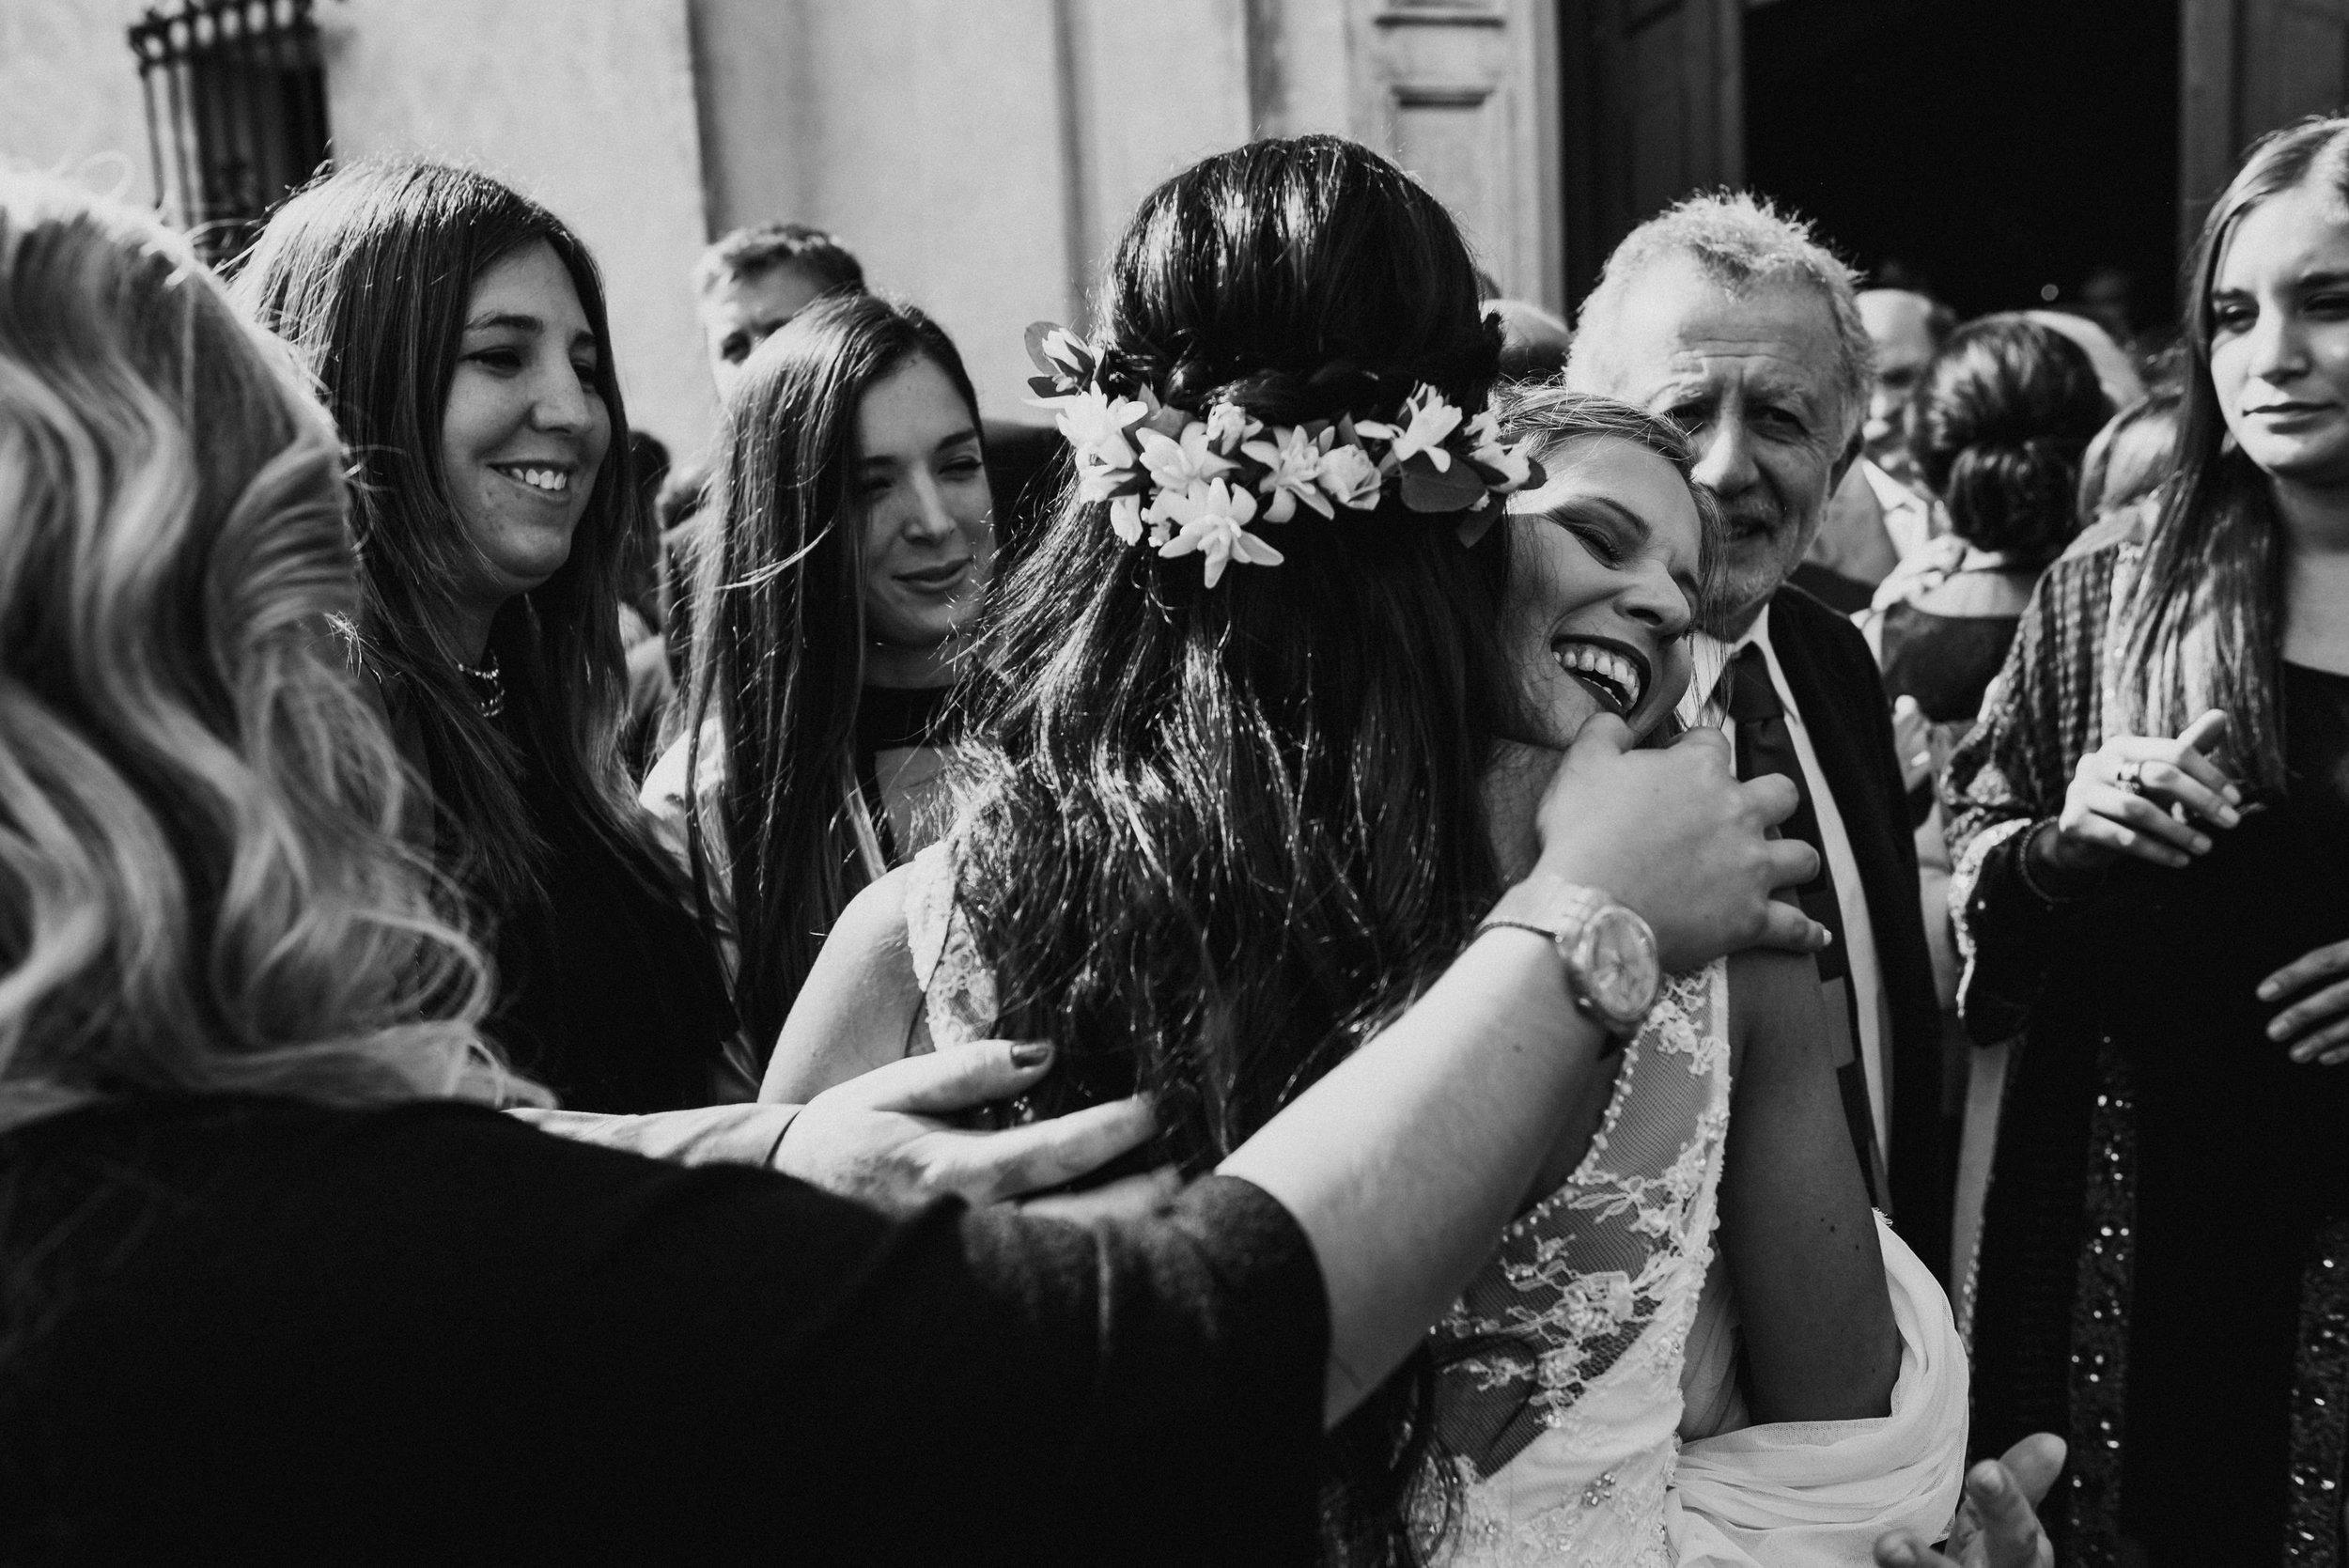 fotografo de bodas en carlos paz cordoba 040.JPG